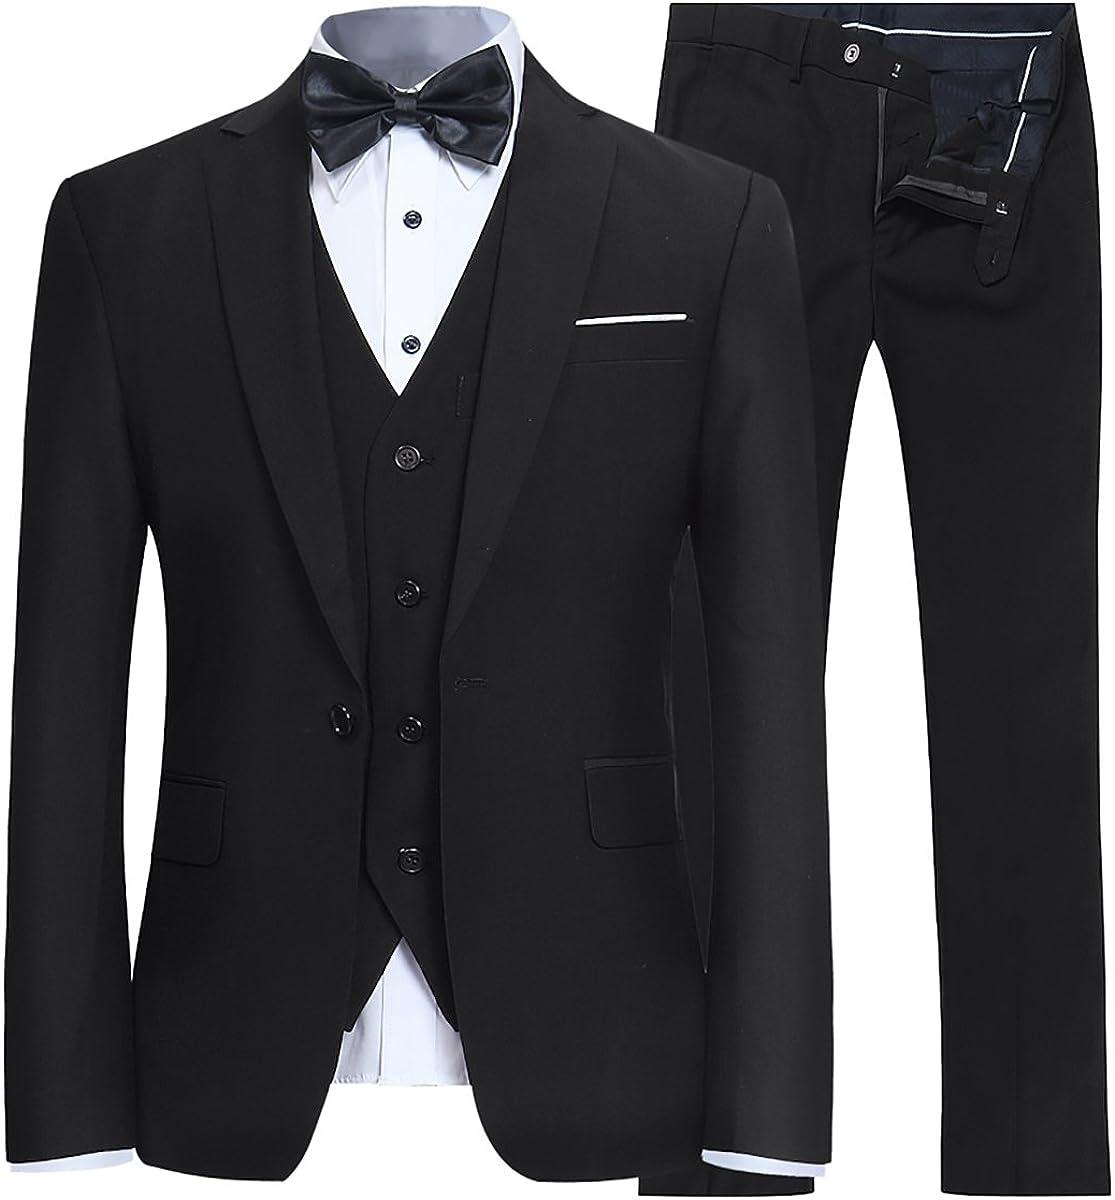 WEEN CHARM Mens Floral 3-Pieces Suit Double Breasted Three Button Dress Suit Blazer Jacket Pants Tux Vest Prom Tuxedo